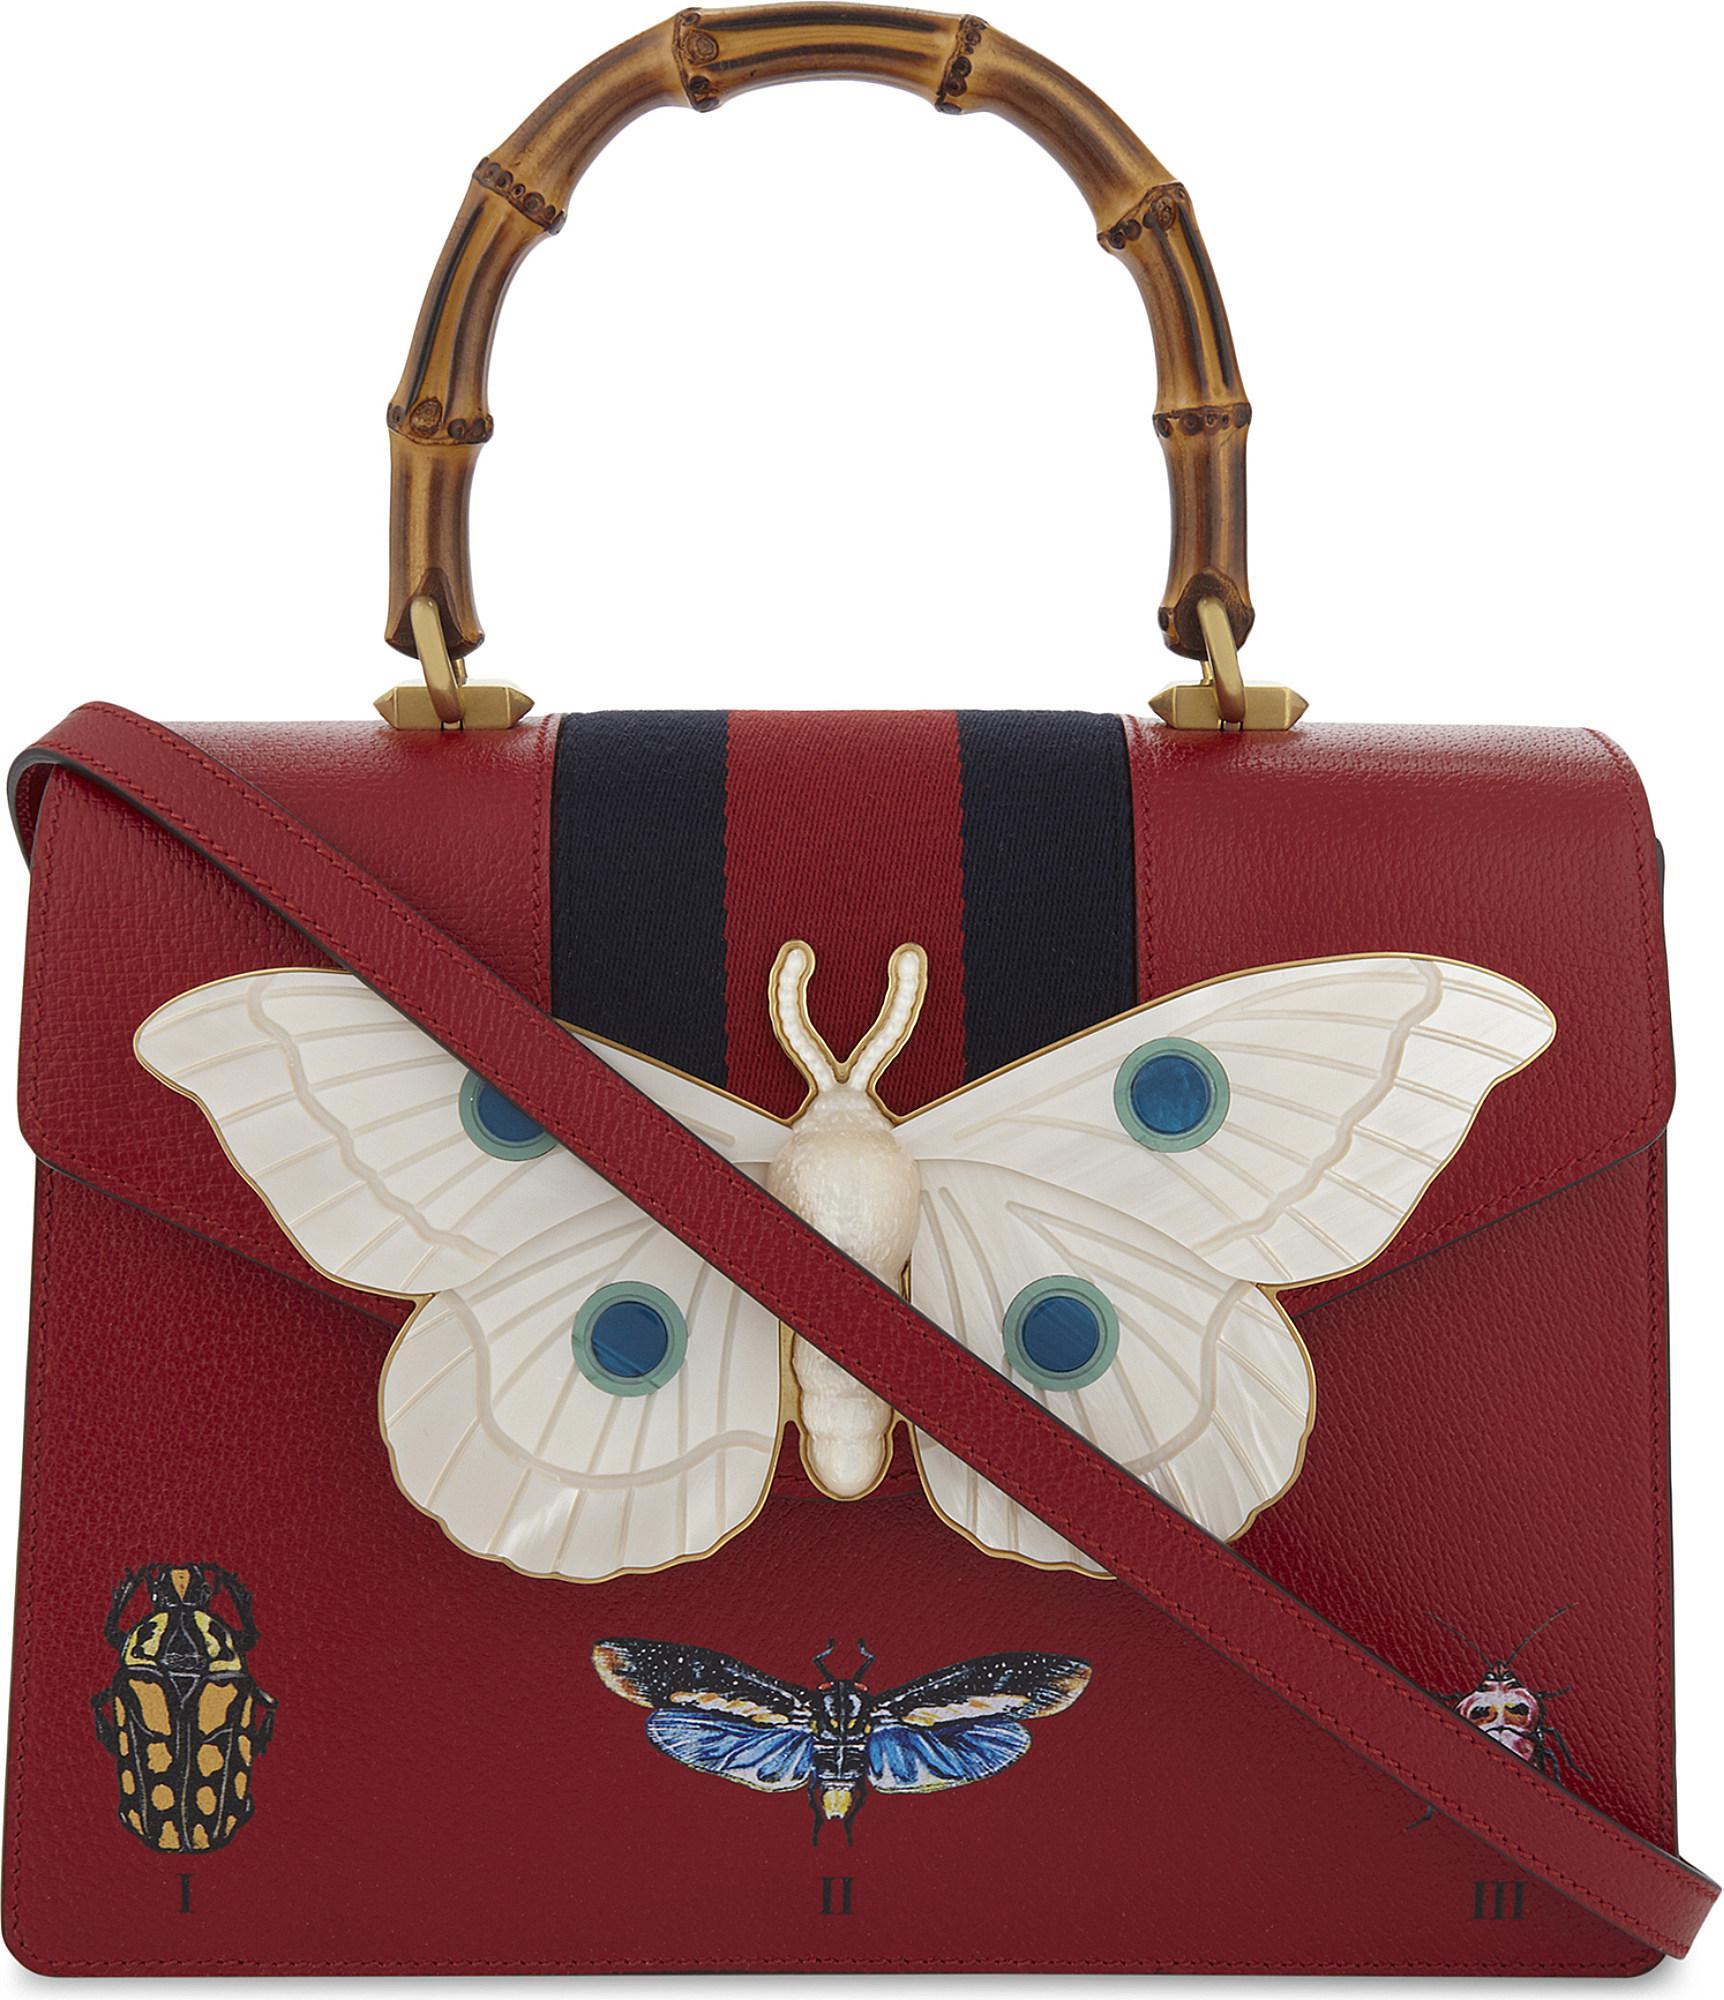 a715d738cb0 Lyst - Gucci Moth Motif Web Stripe Leather Shoulder Bag in Red